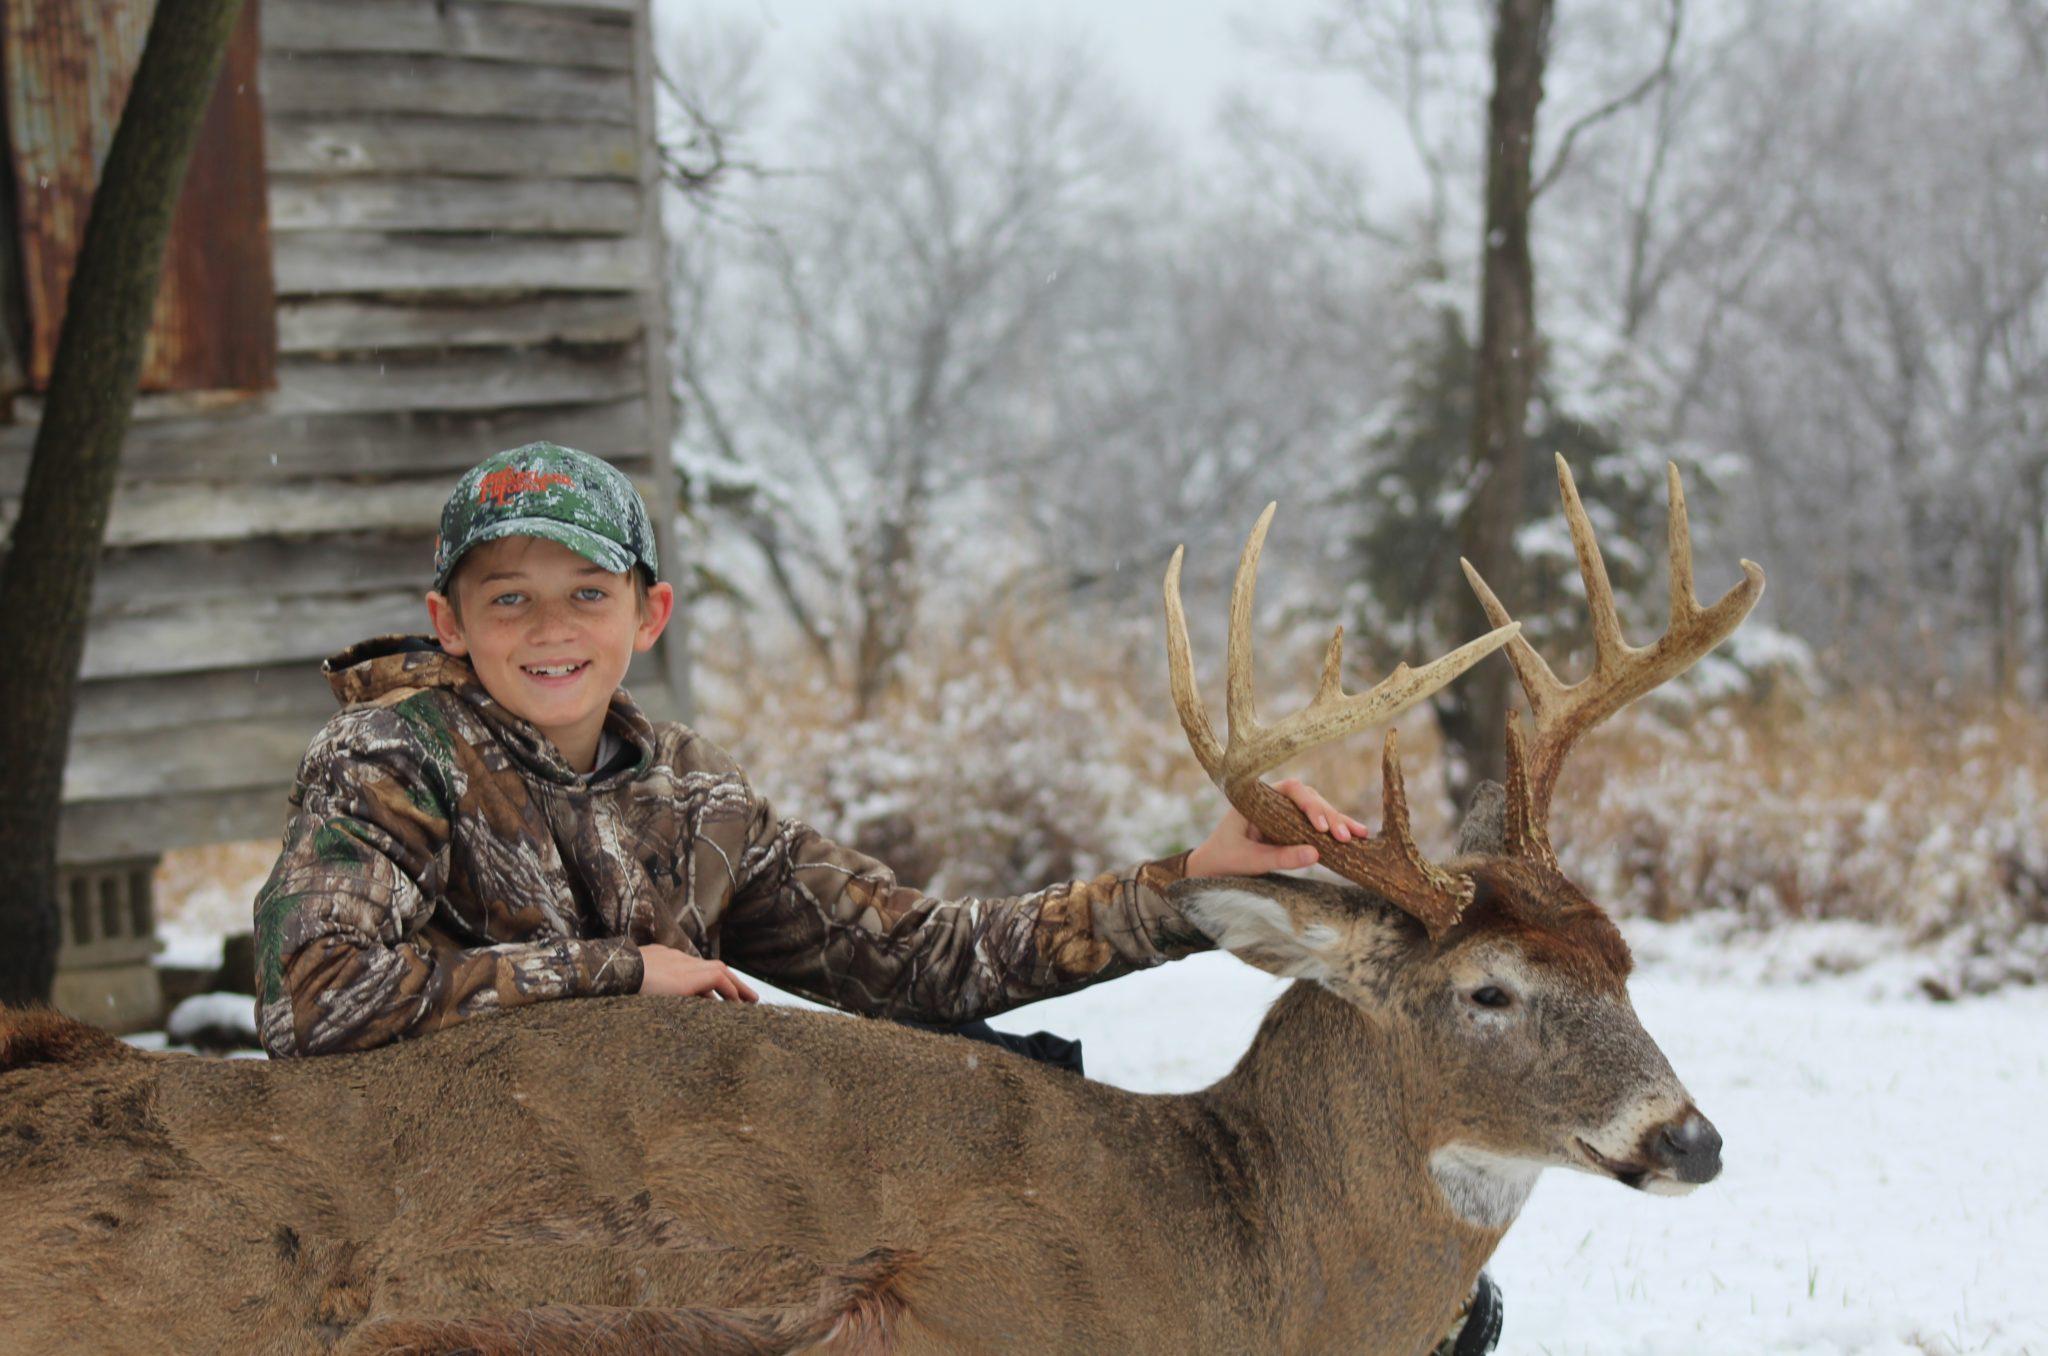 Late Season Whitetail Hunting: Illinois Late Deer Hunts throughout Whitetail Deer Rut 2021